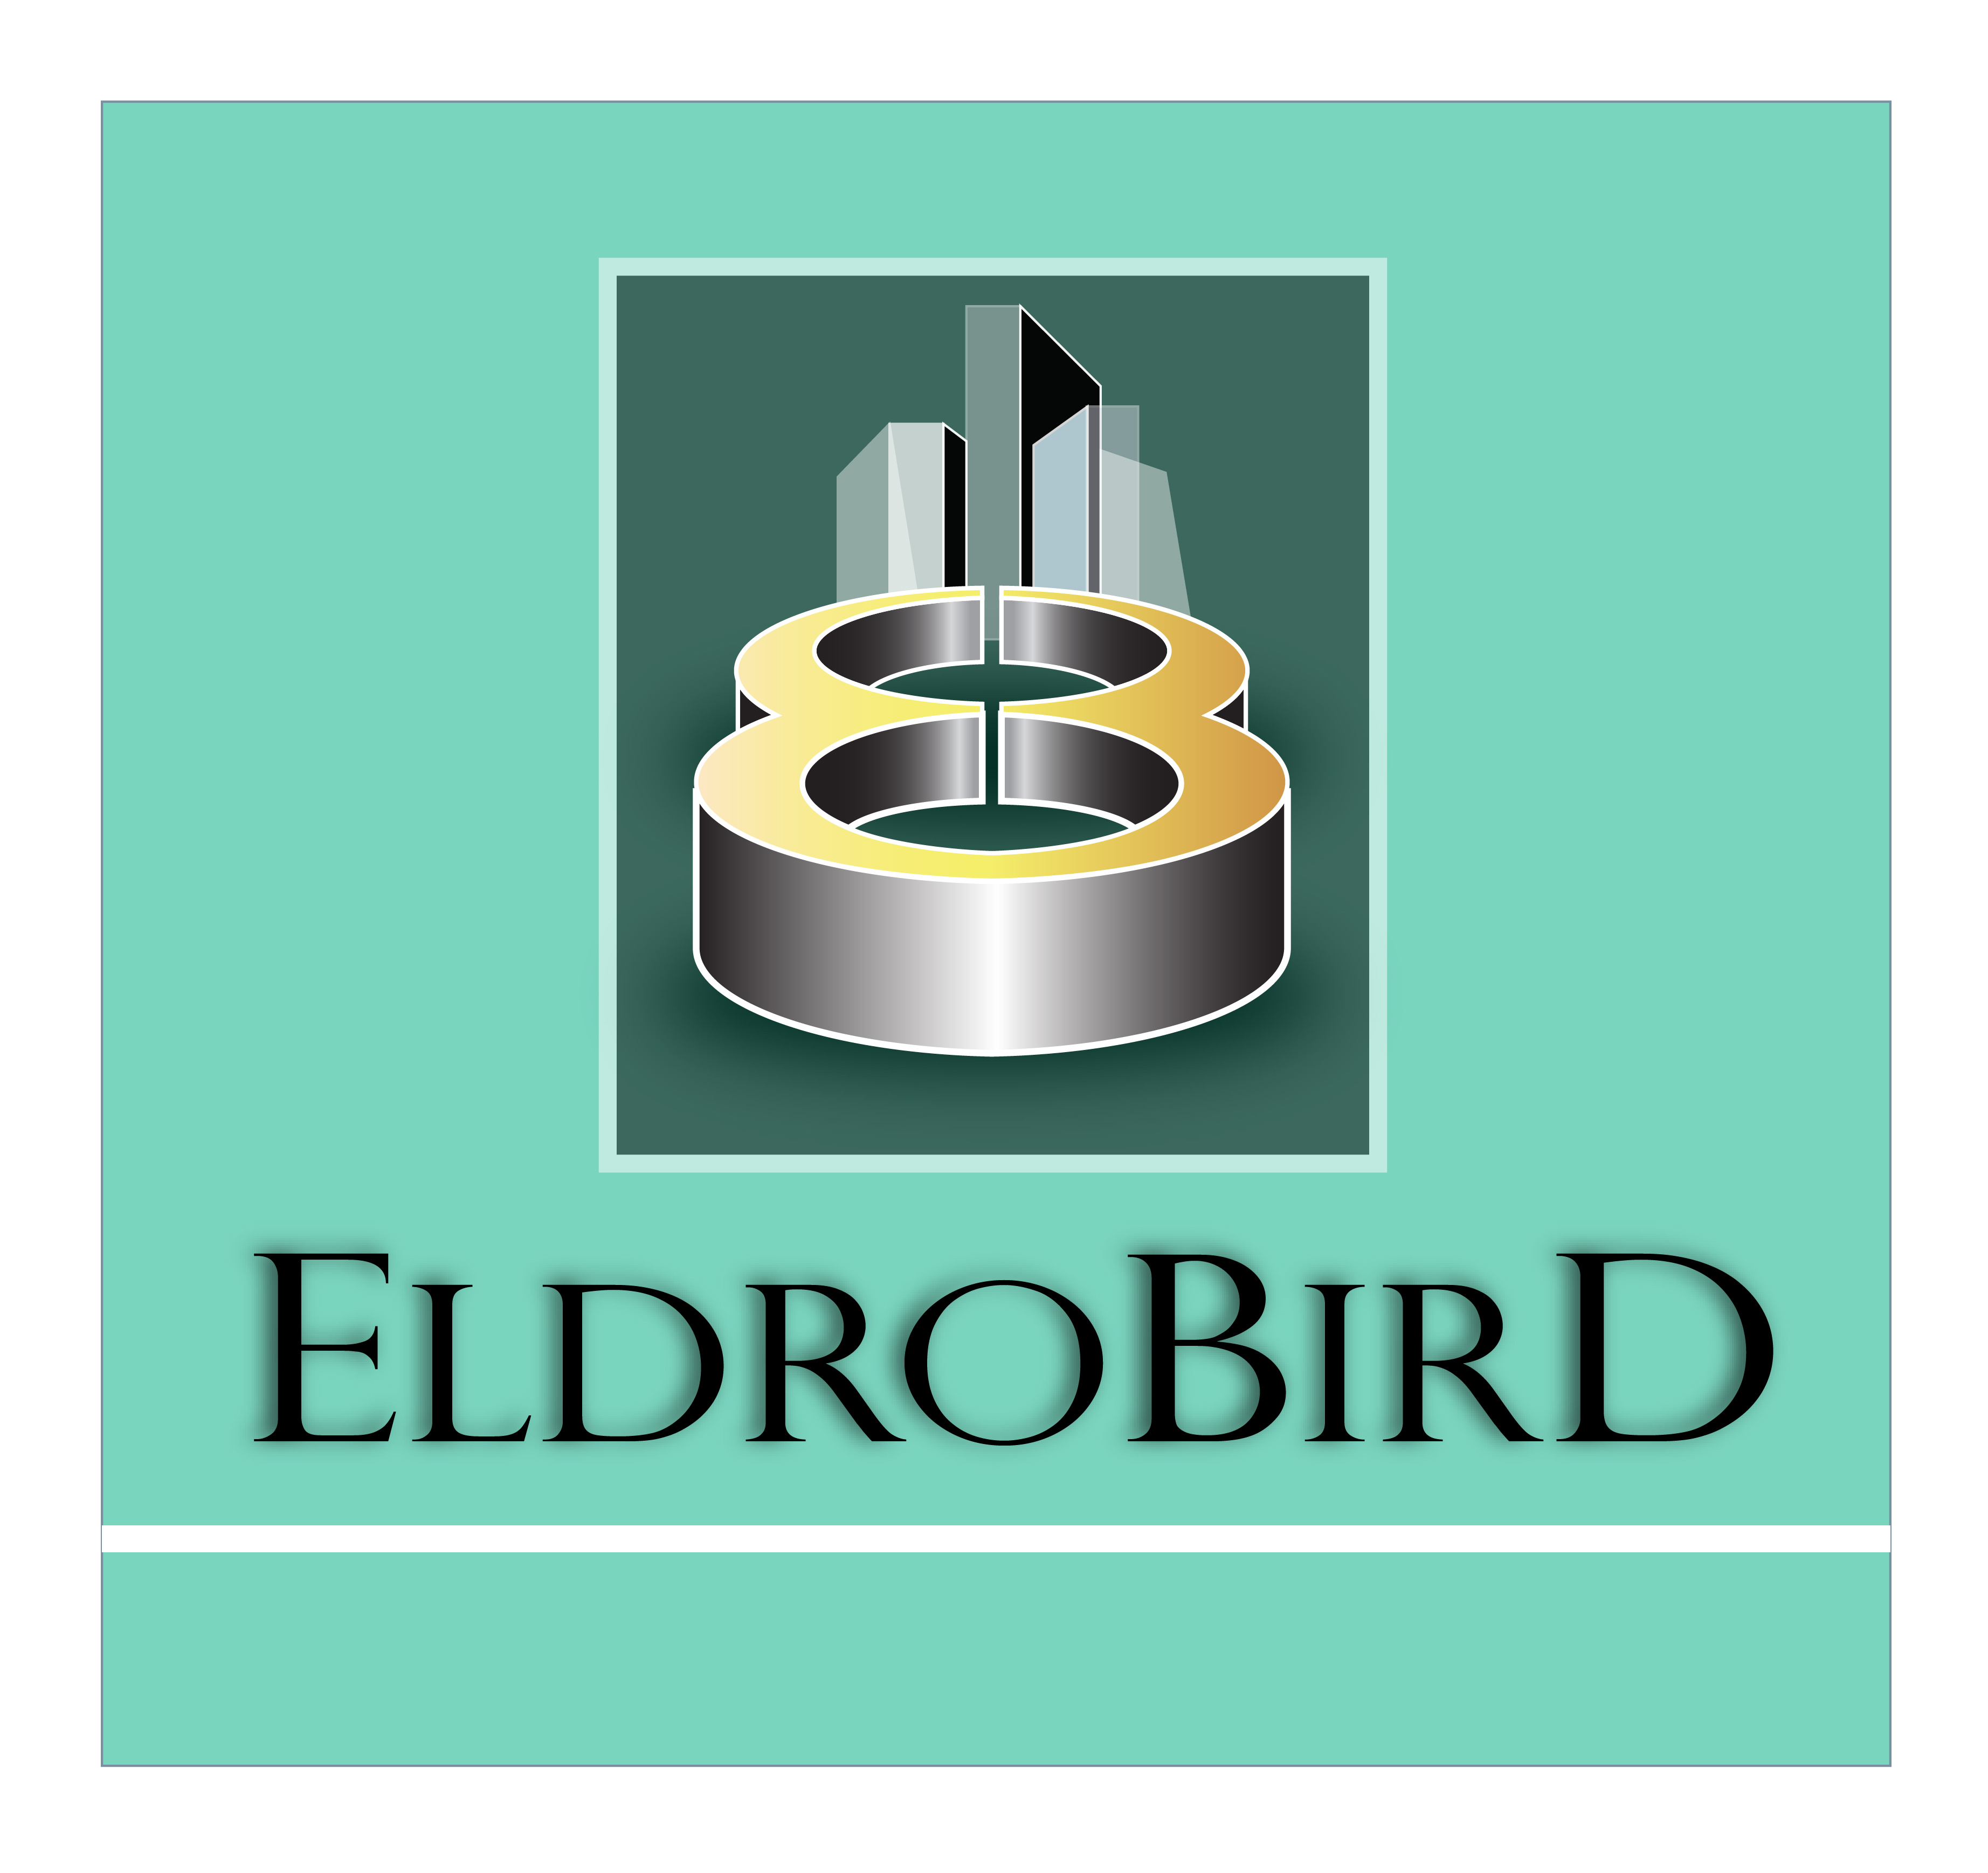 Logo Design by kowreck - Entry No. 71 in the Logo Design Contest New Logo Design for Bird car.